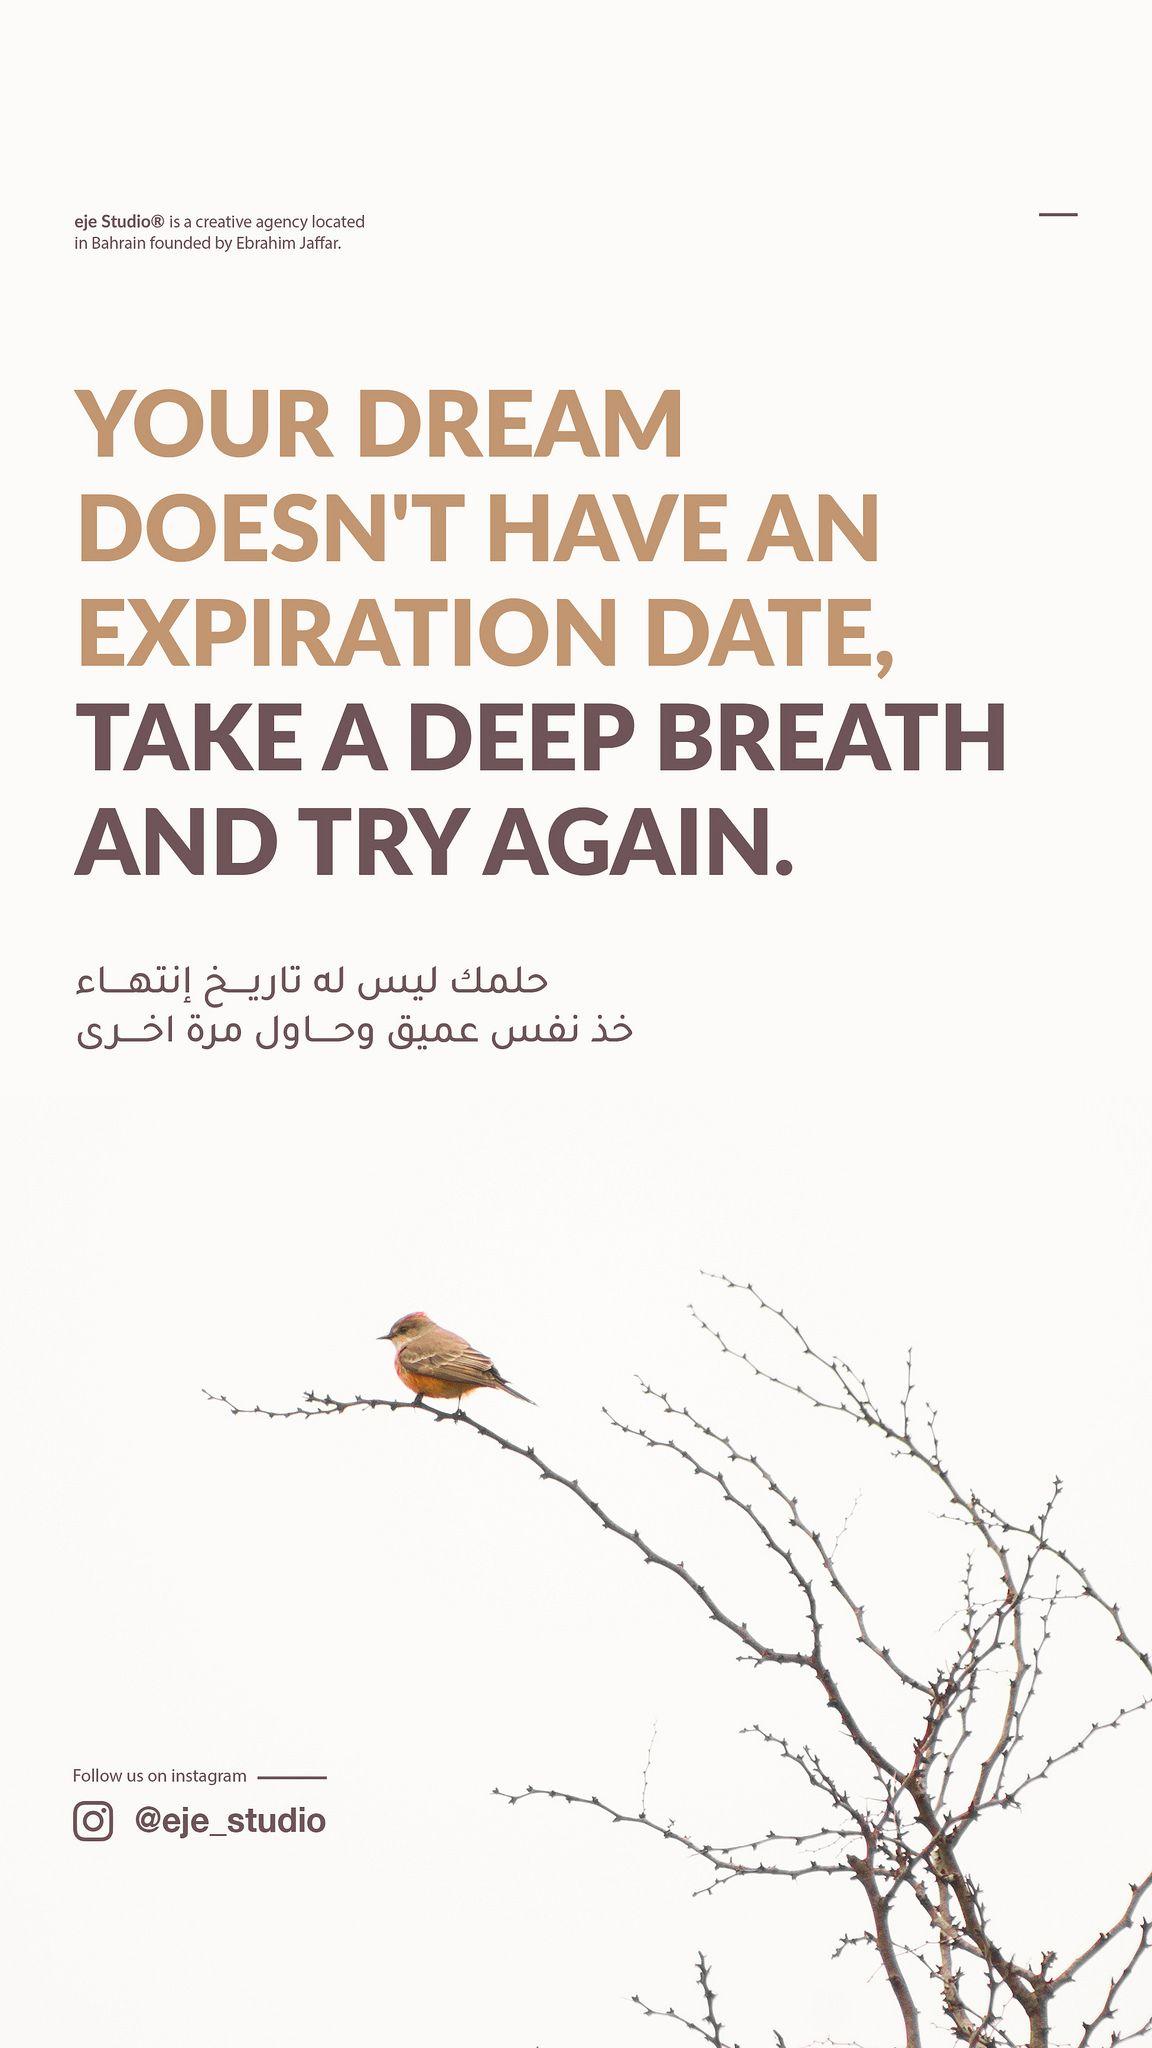 Arabic English Quotes Eje Studio Ebrahim Jaffar English Quotes Arabic English Quotes Fb Cover Photos Quotes